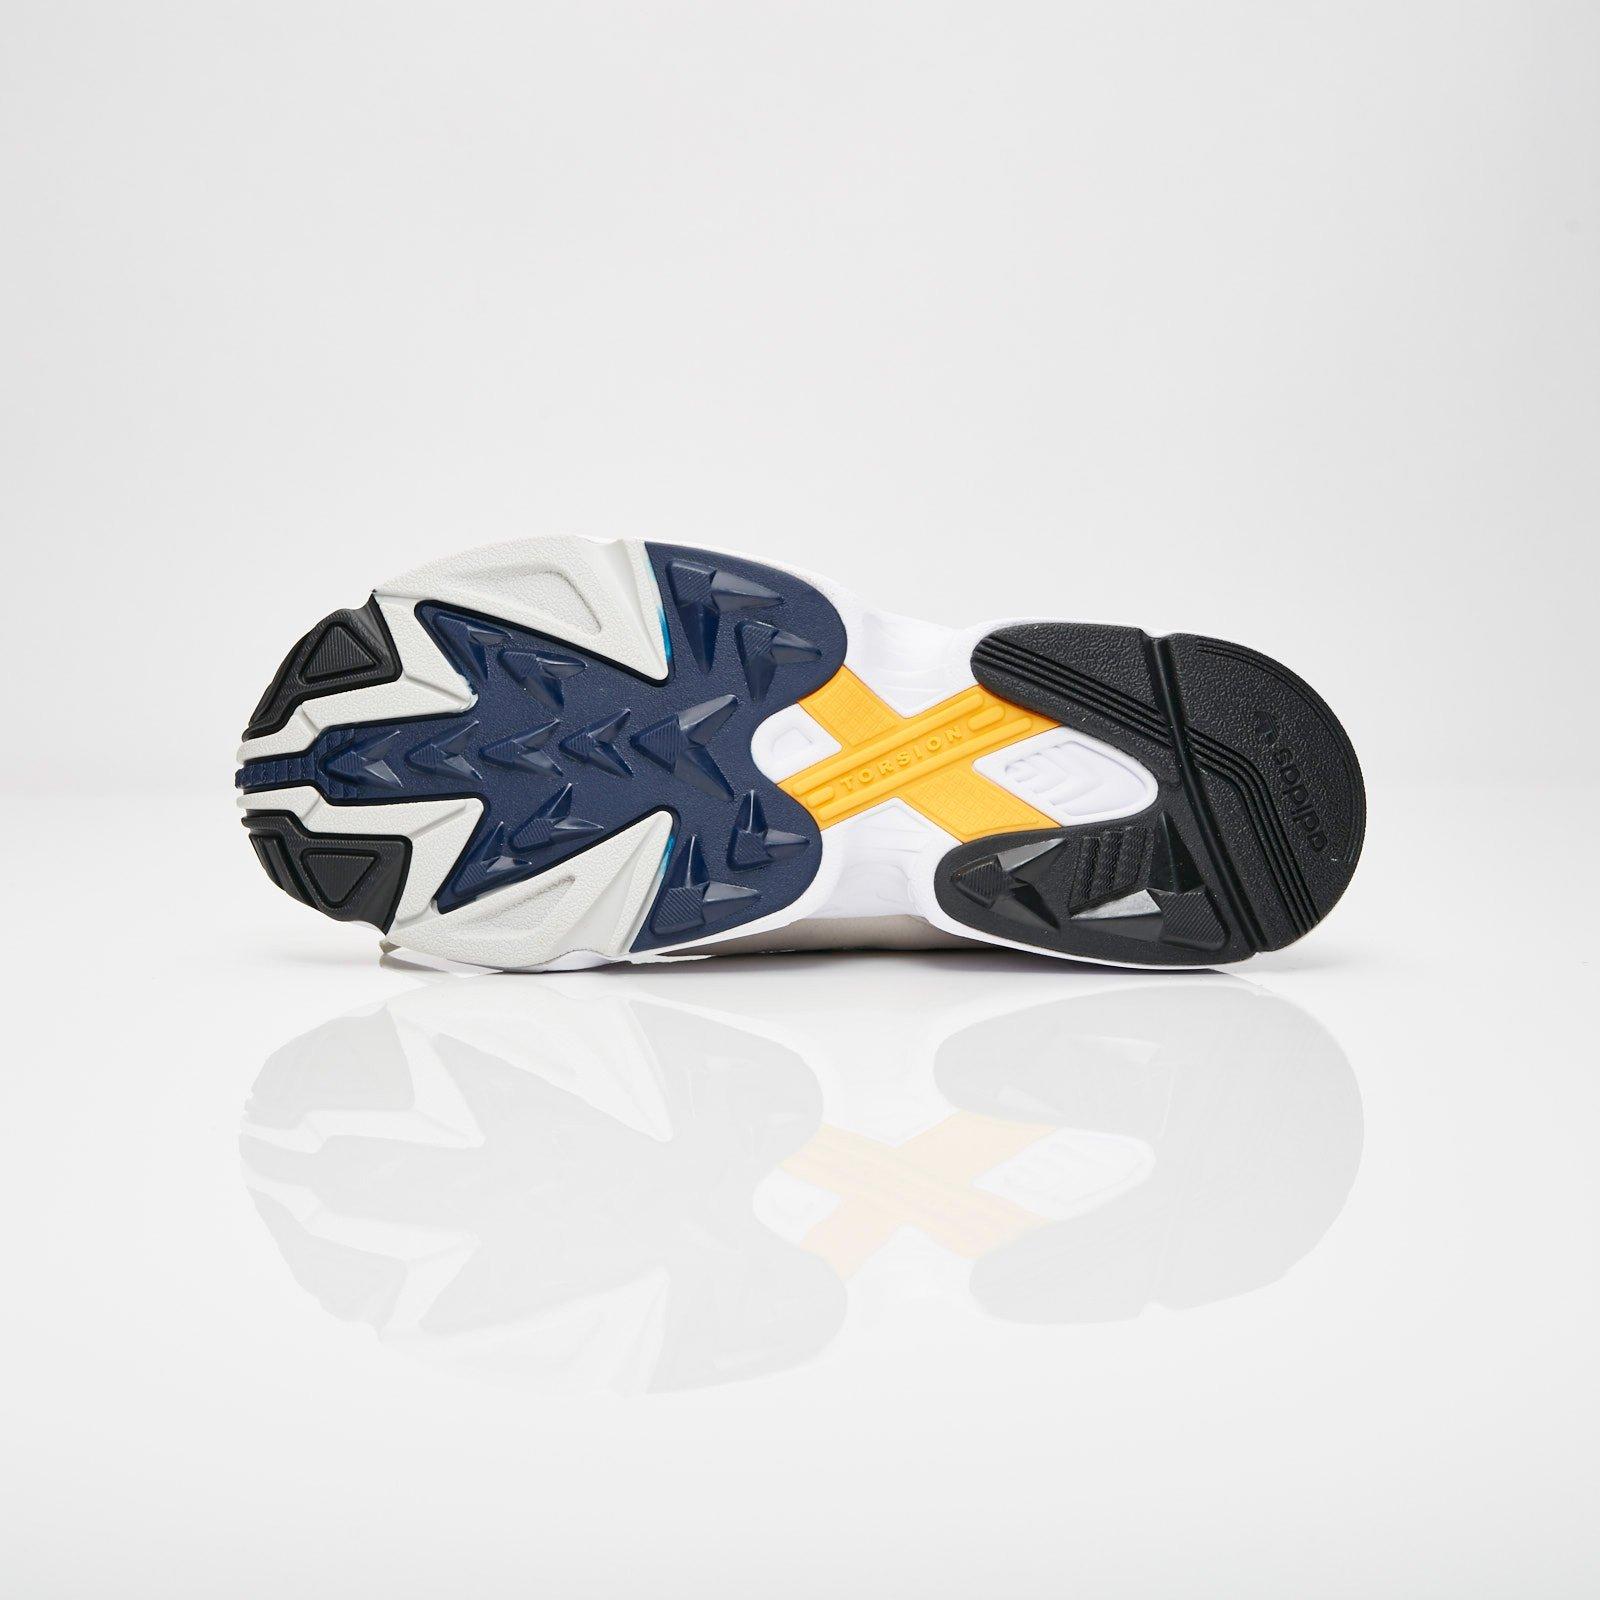 timeless design 0963e 1d8fe ... adidas Consortium Falcon Workshop ...